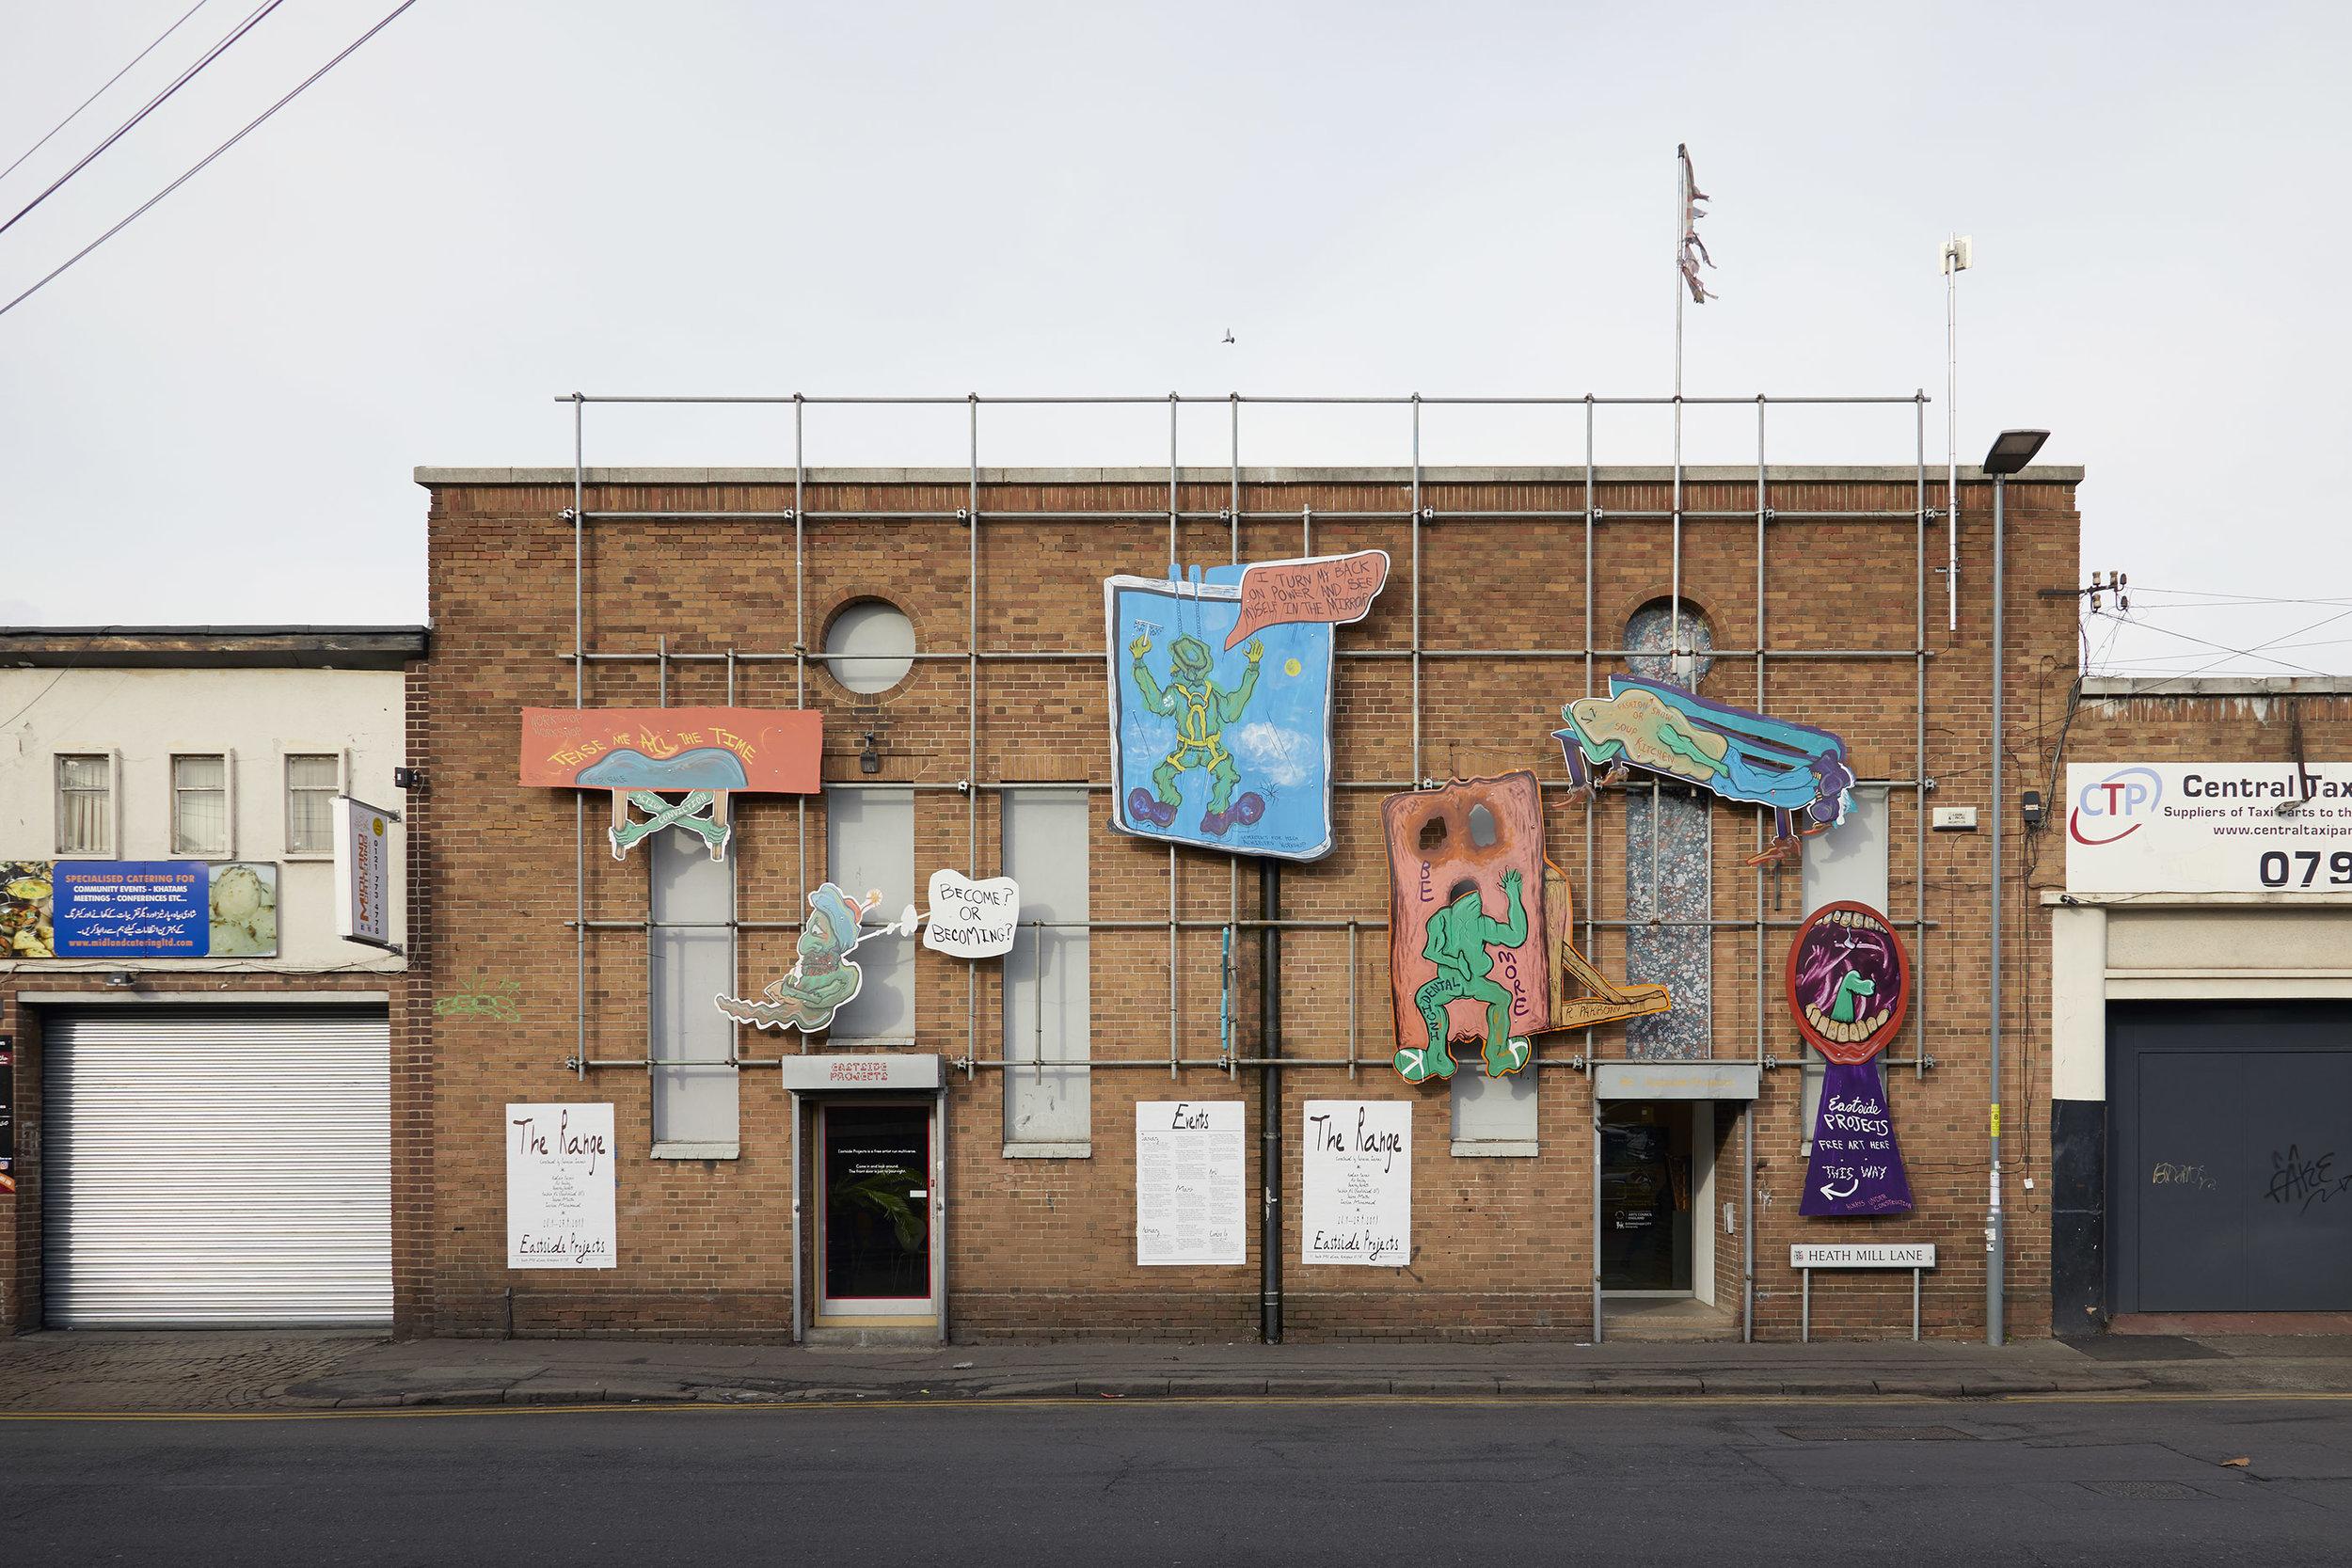 BAME Storm , Hardeep Pandhal, Eastside Projects, Birmingham. Image by Stuart Whipps